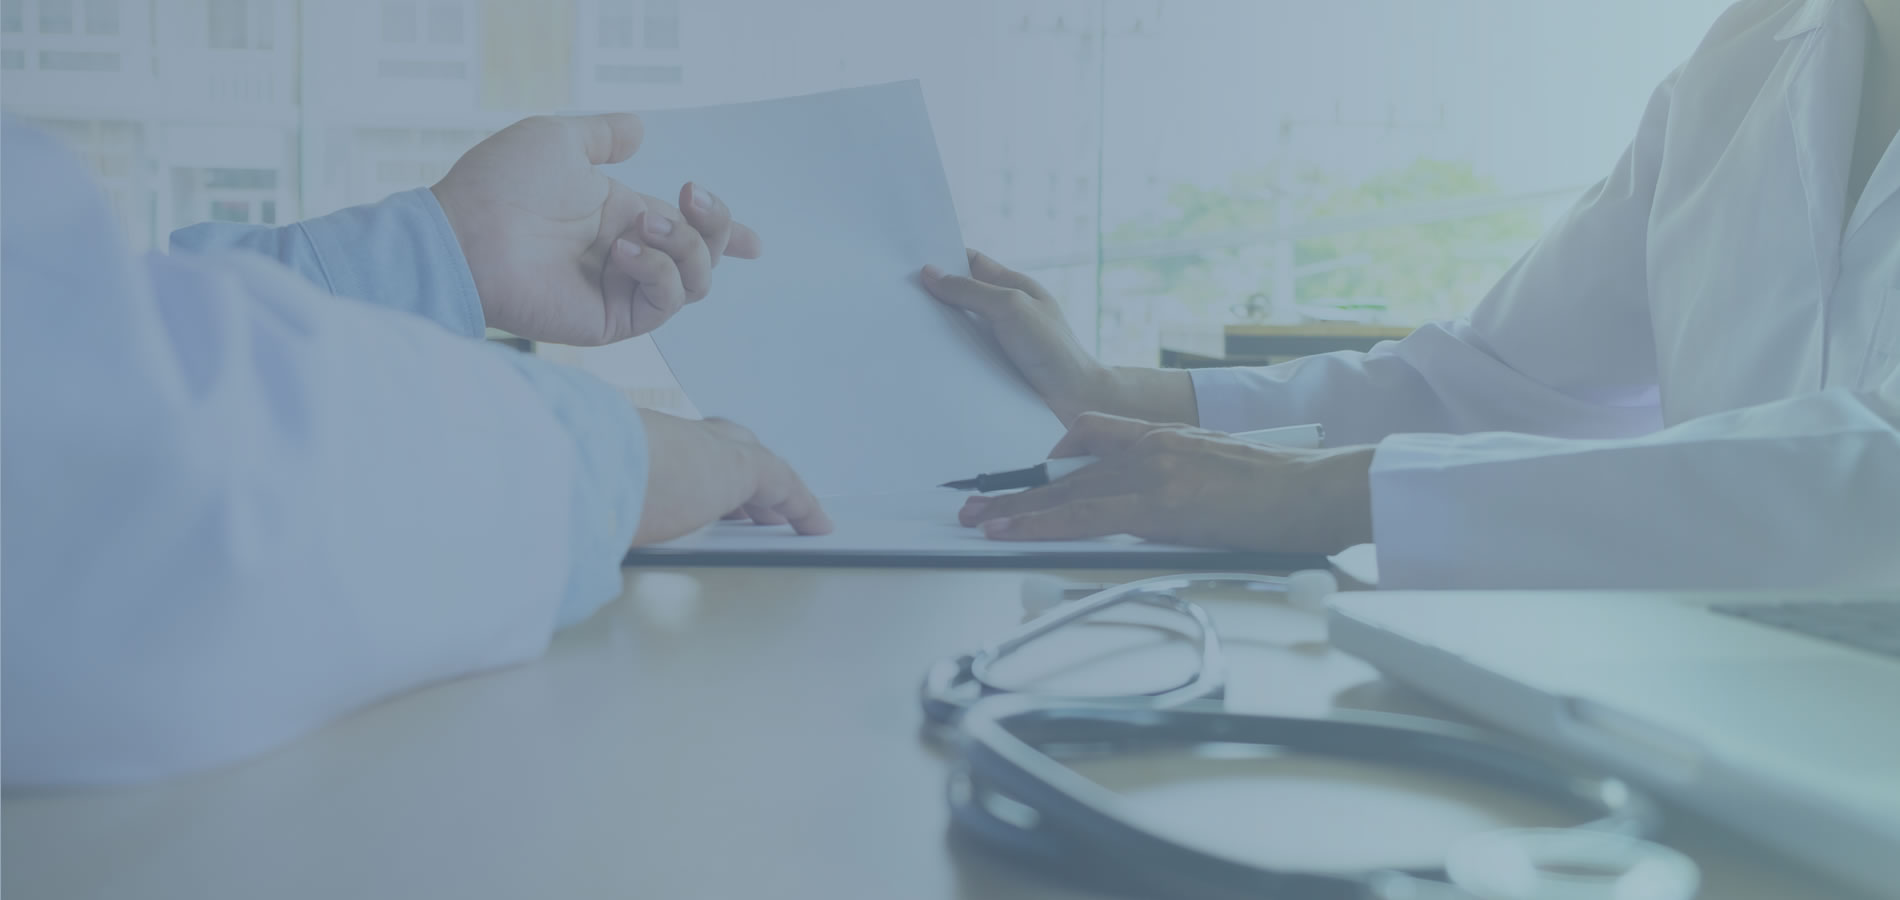 cardiotech health care ireland official enverdis cardiological vascular equipment supplier private hospitals